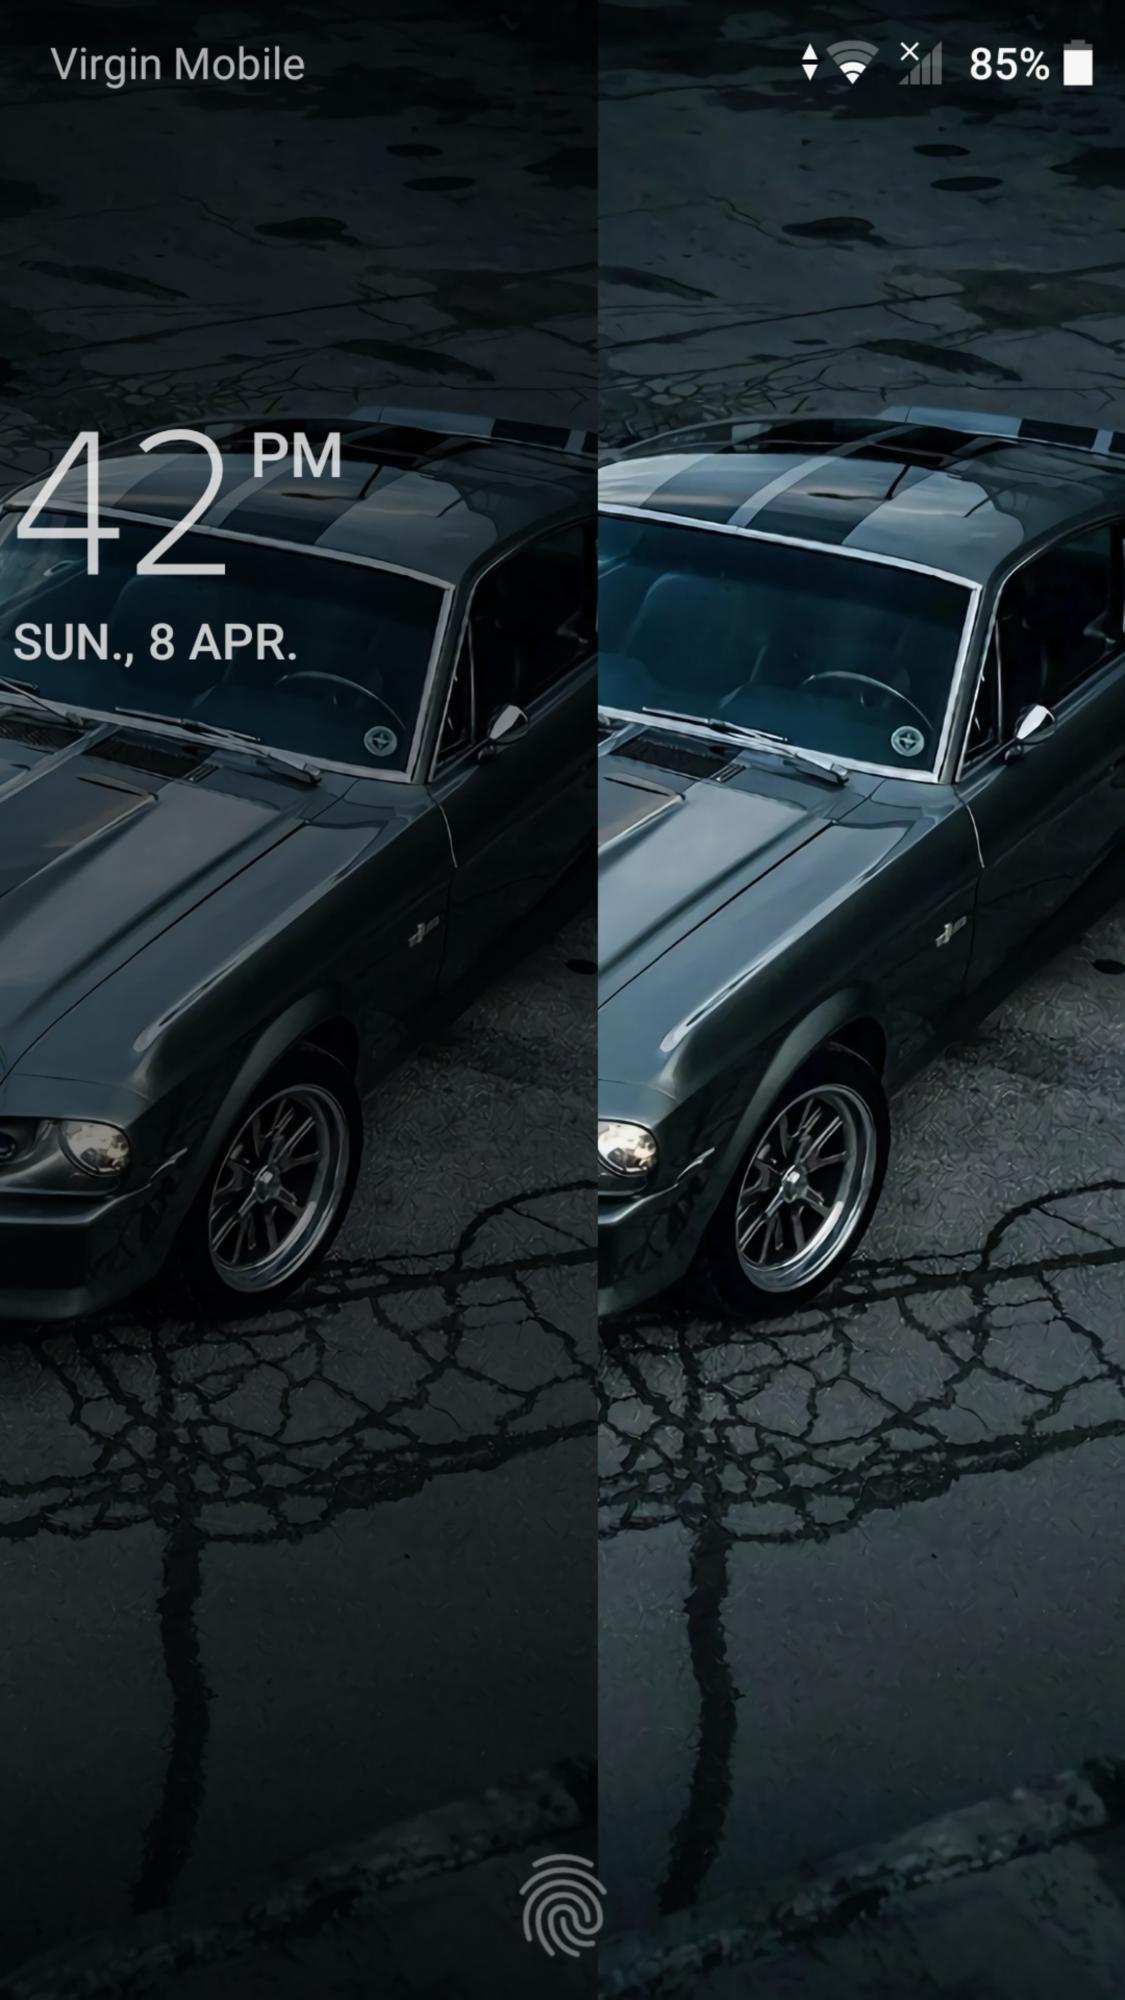 Lock Screen Wallpaper Darker Than Home Screen Sony Xperia Xz